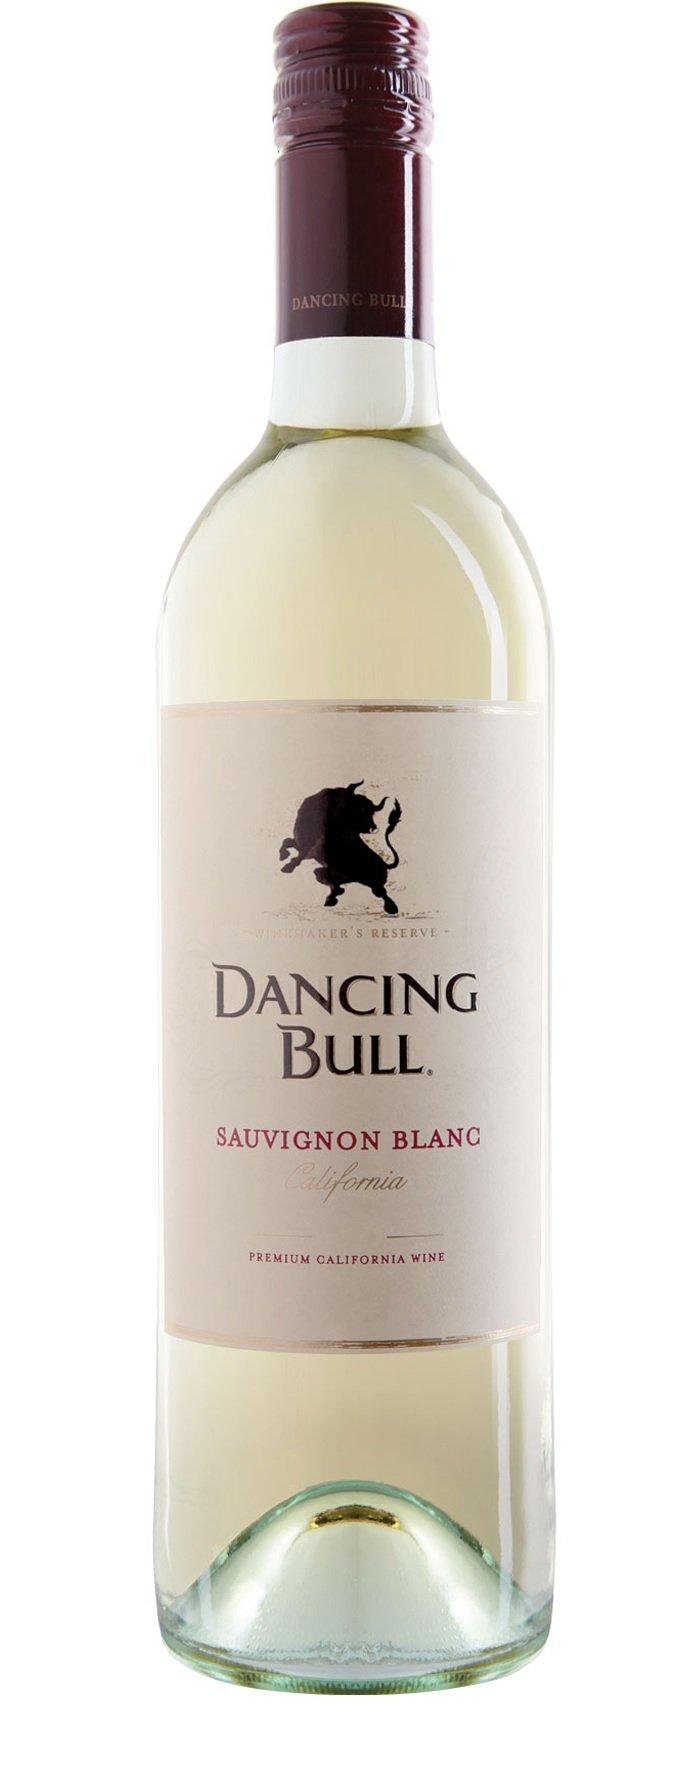 6-x-075l-2017er-Rancho-Zabaco-Dancing-Bull-Sauvignon-Blanc-Kalifornien-Weiwein-trocken